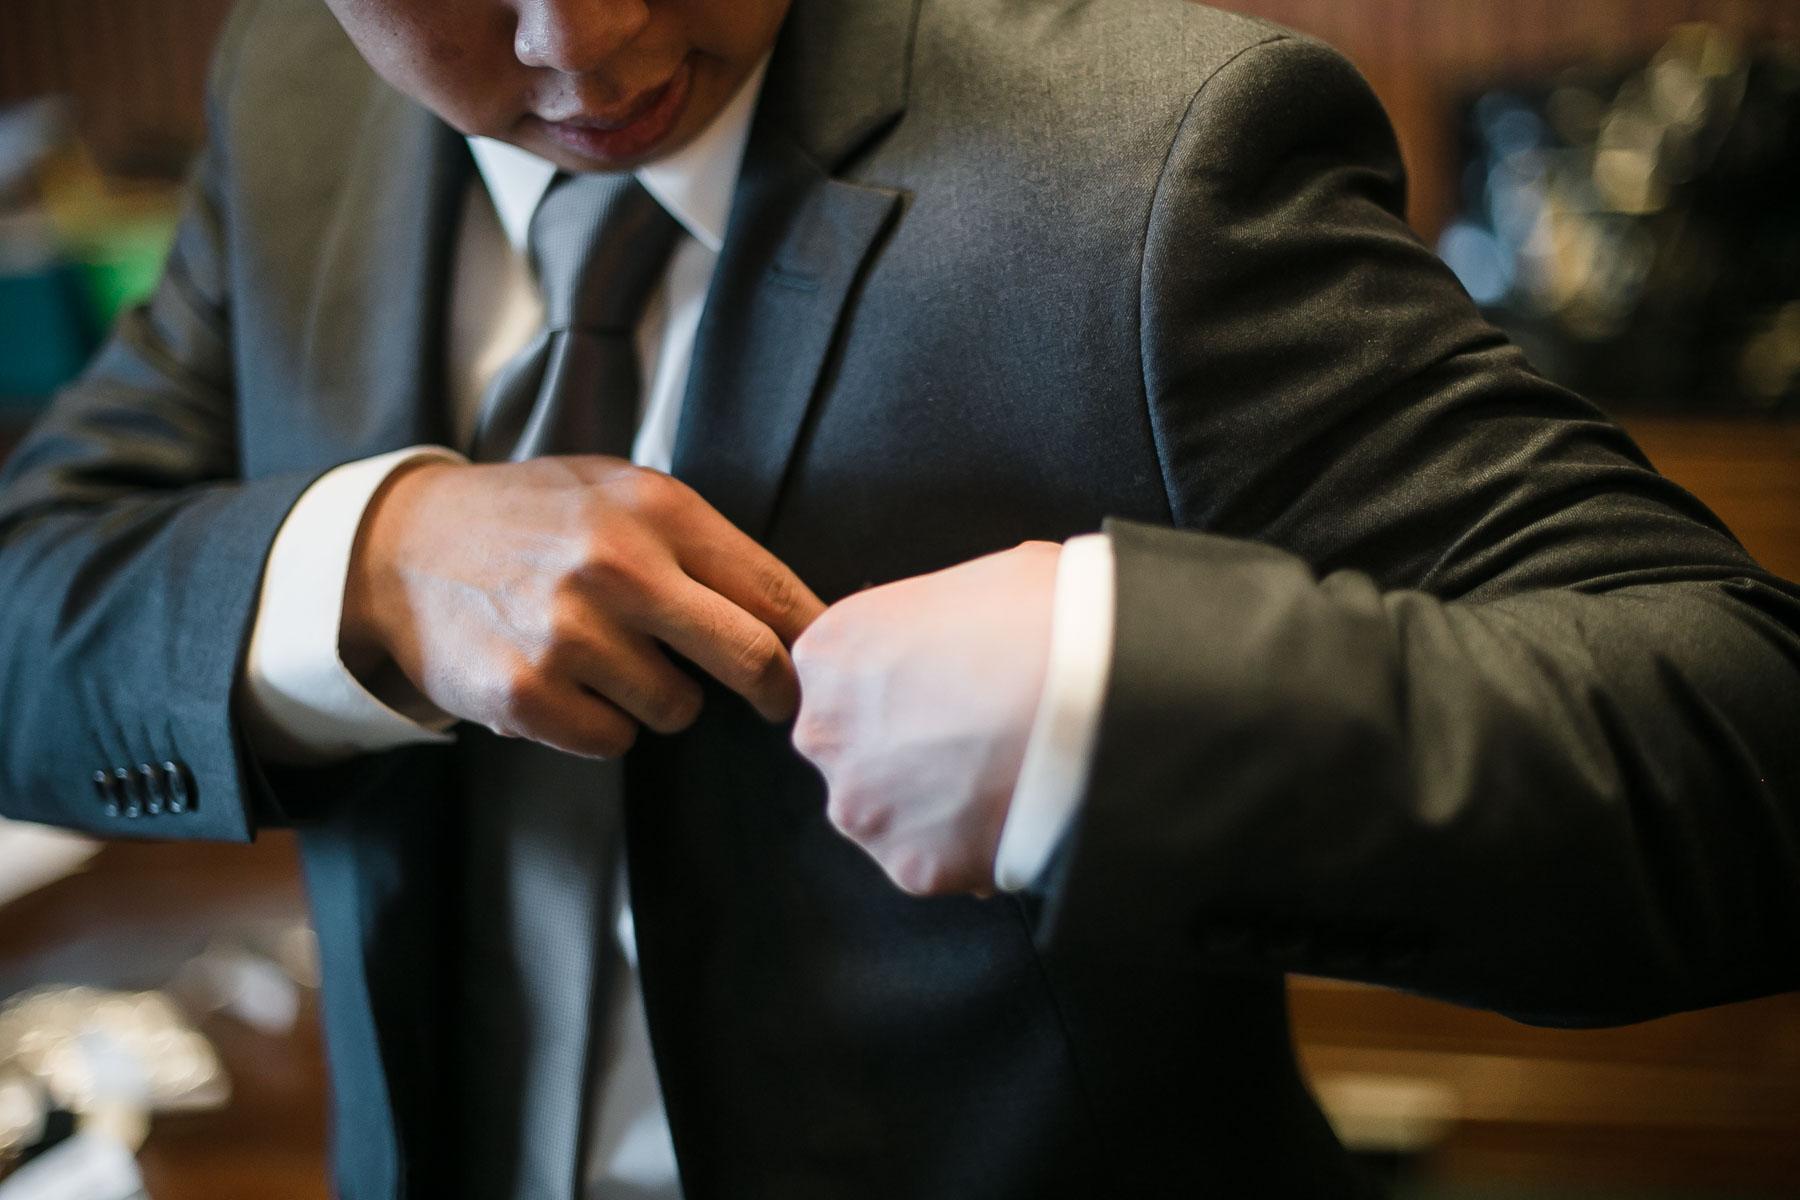 toledo-club-wedding-photos (17 of 101).jpg